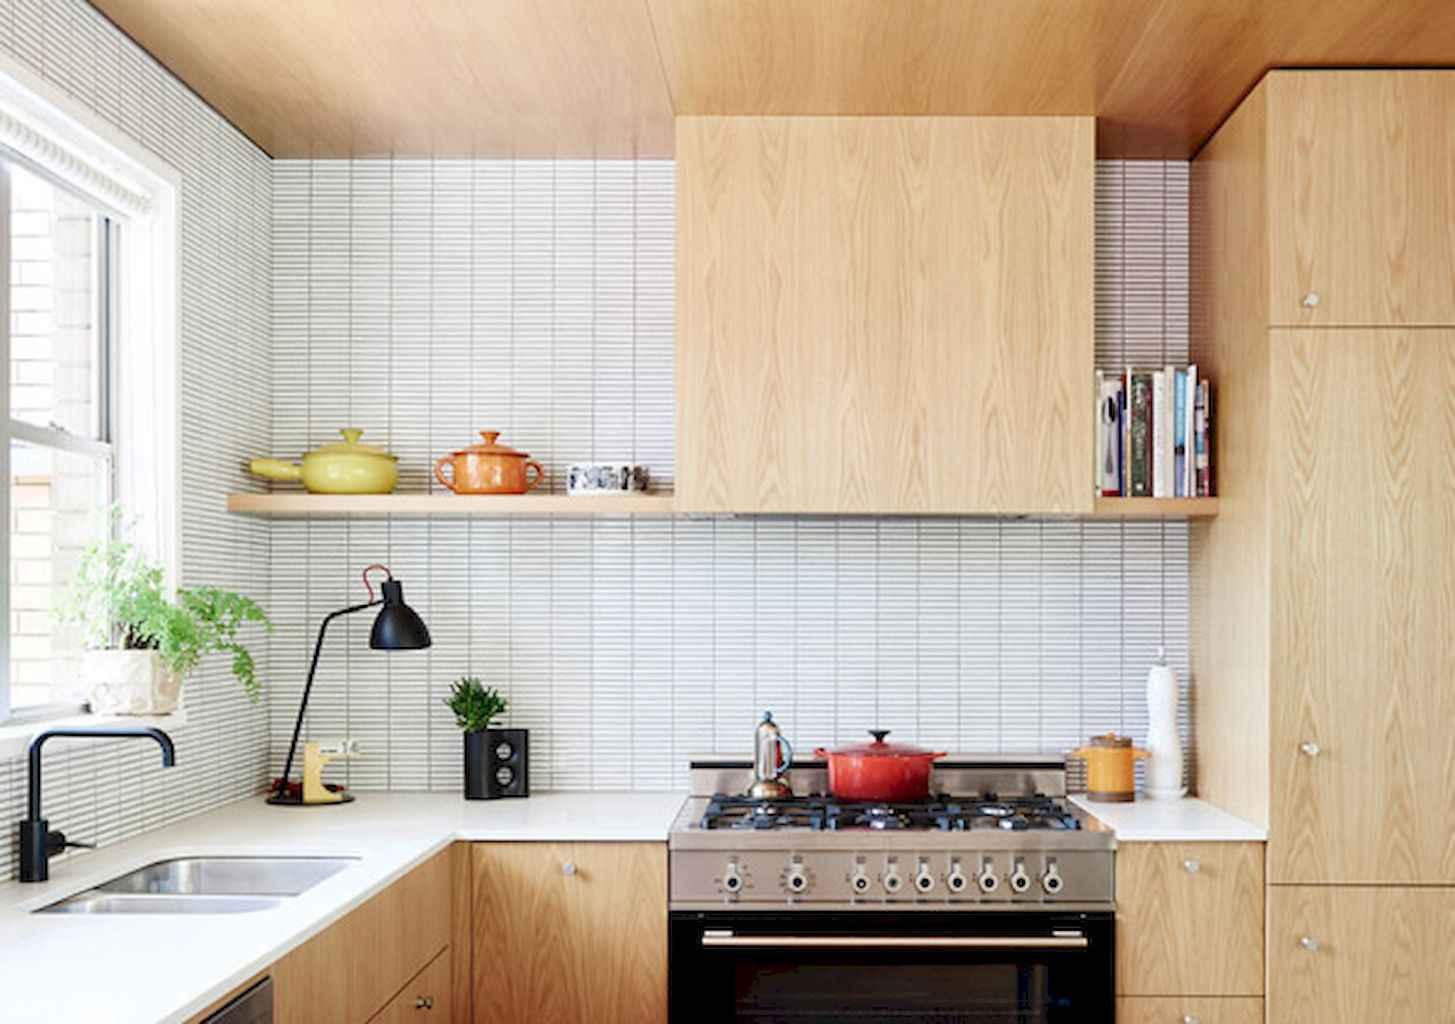 Mid century modern kitchen design ideas (26)